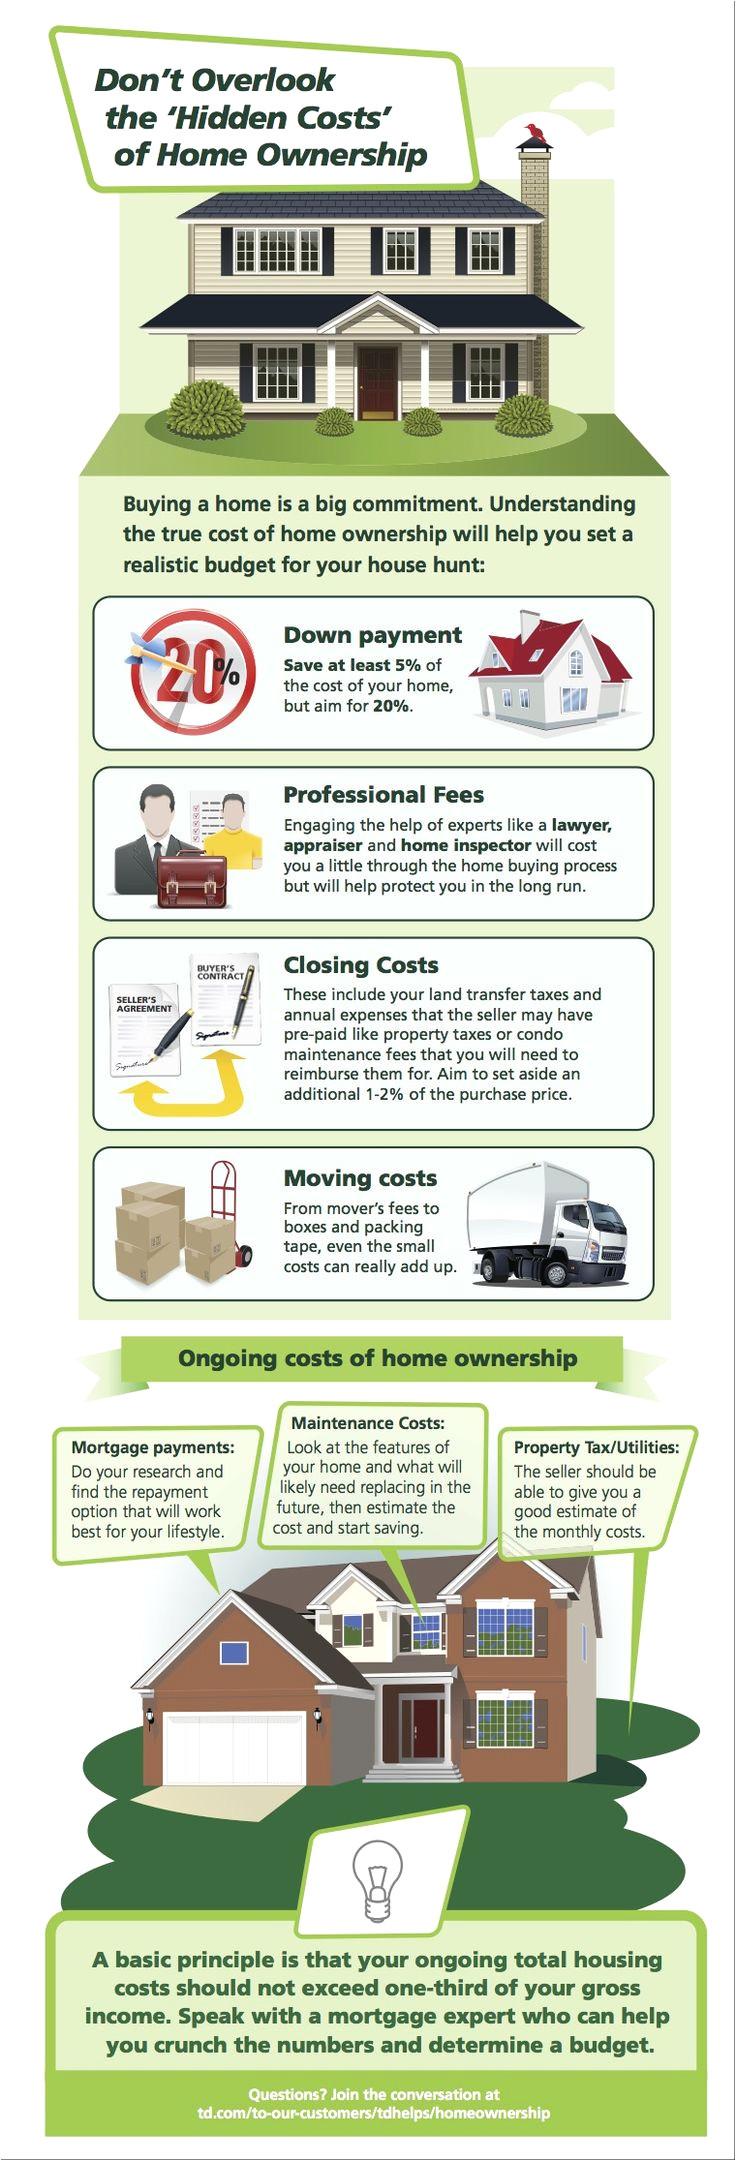 home ownership savings plan fresh home savings plan home ownership savings plan the obvious